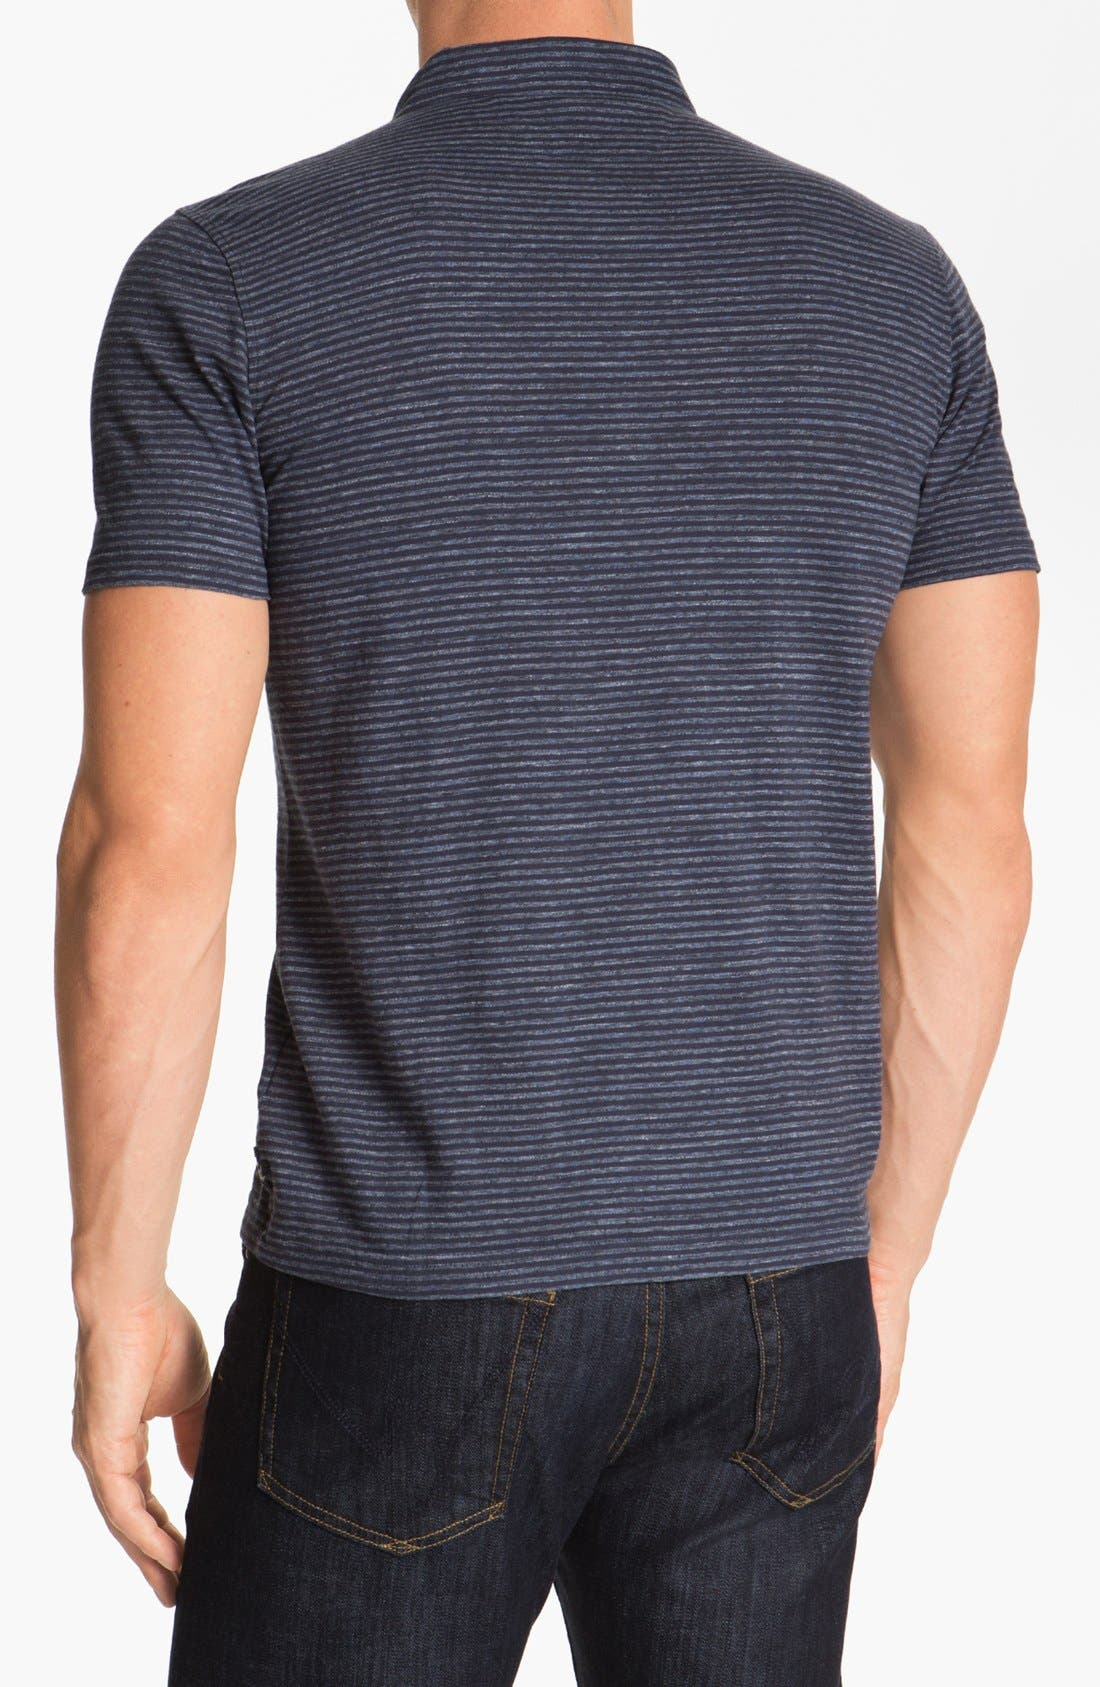 Alternate Image 2  - Façonnable Tailored Denim Knit Polo